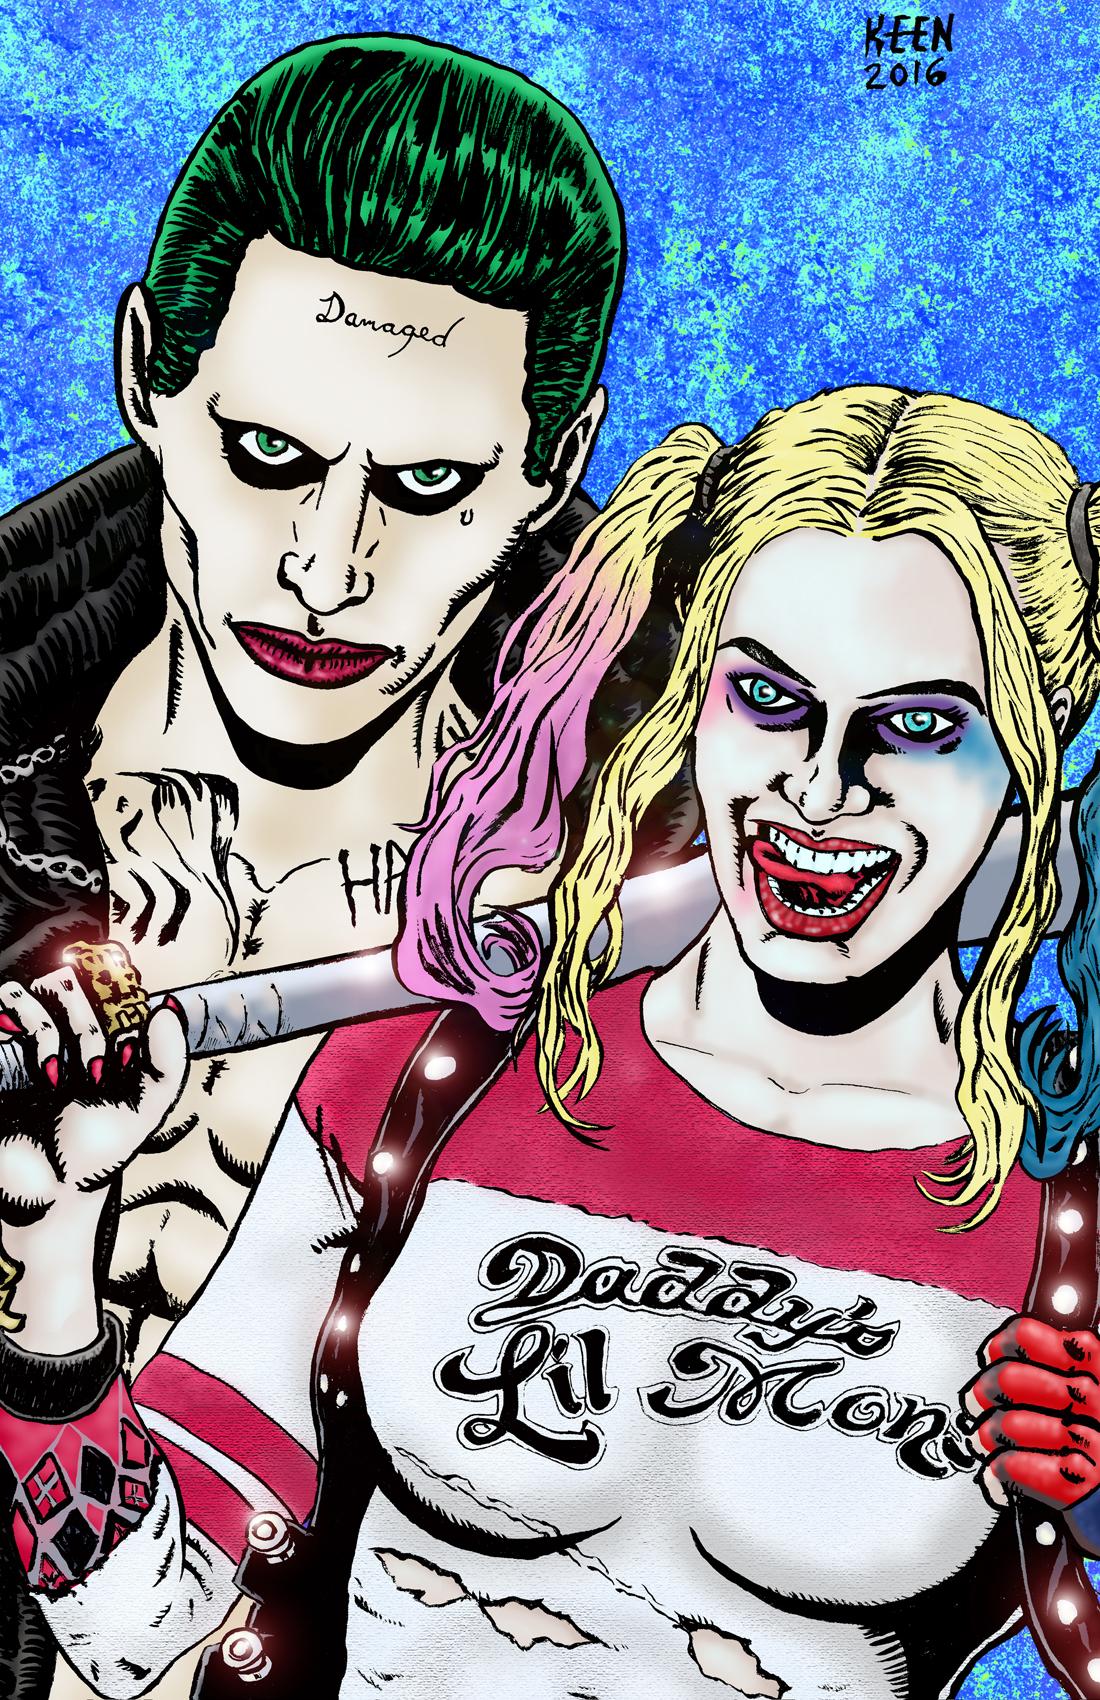 harley quinn and joker midnight horizon comics online store